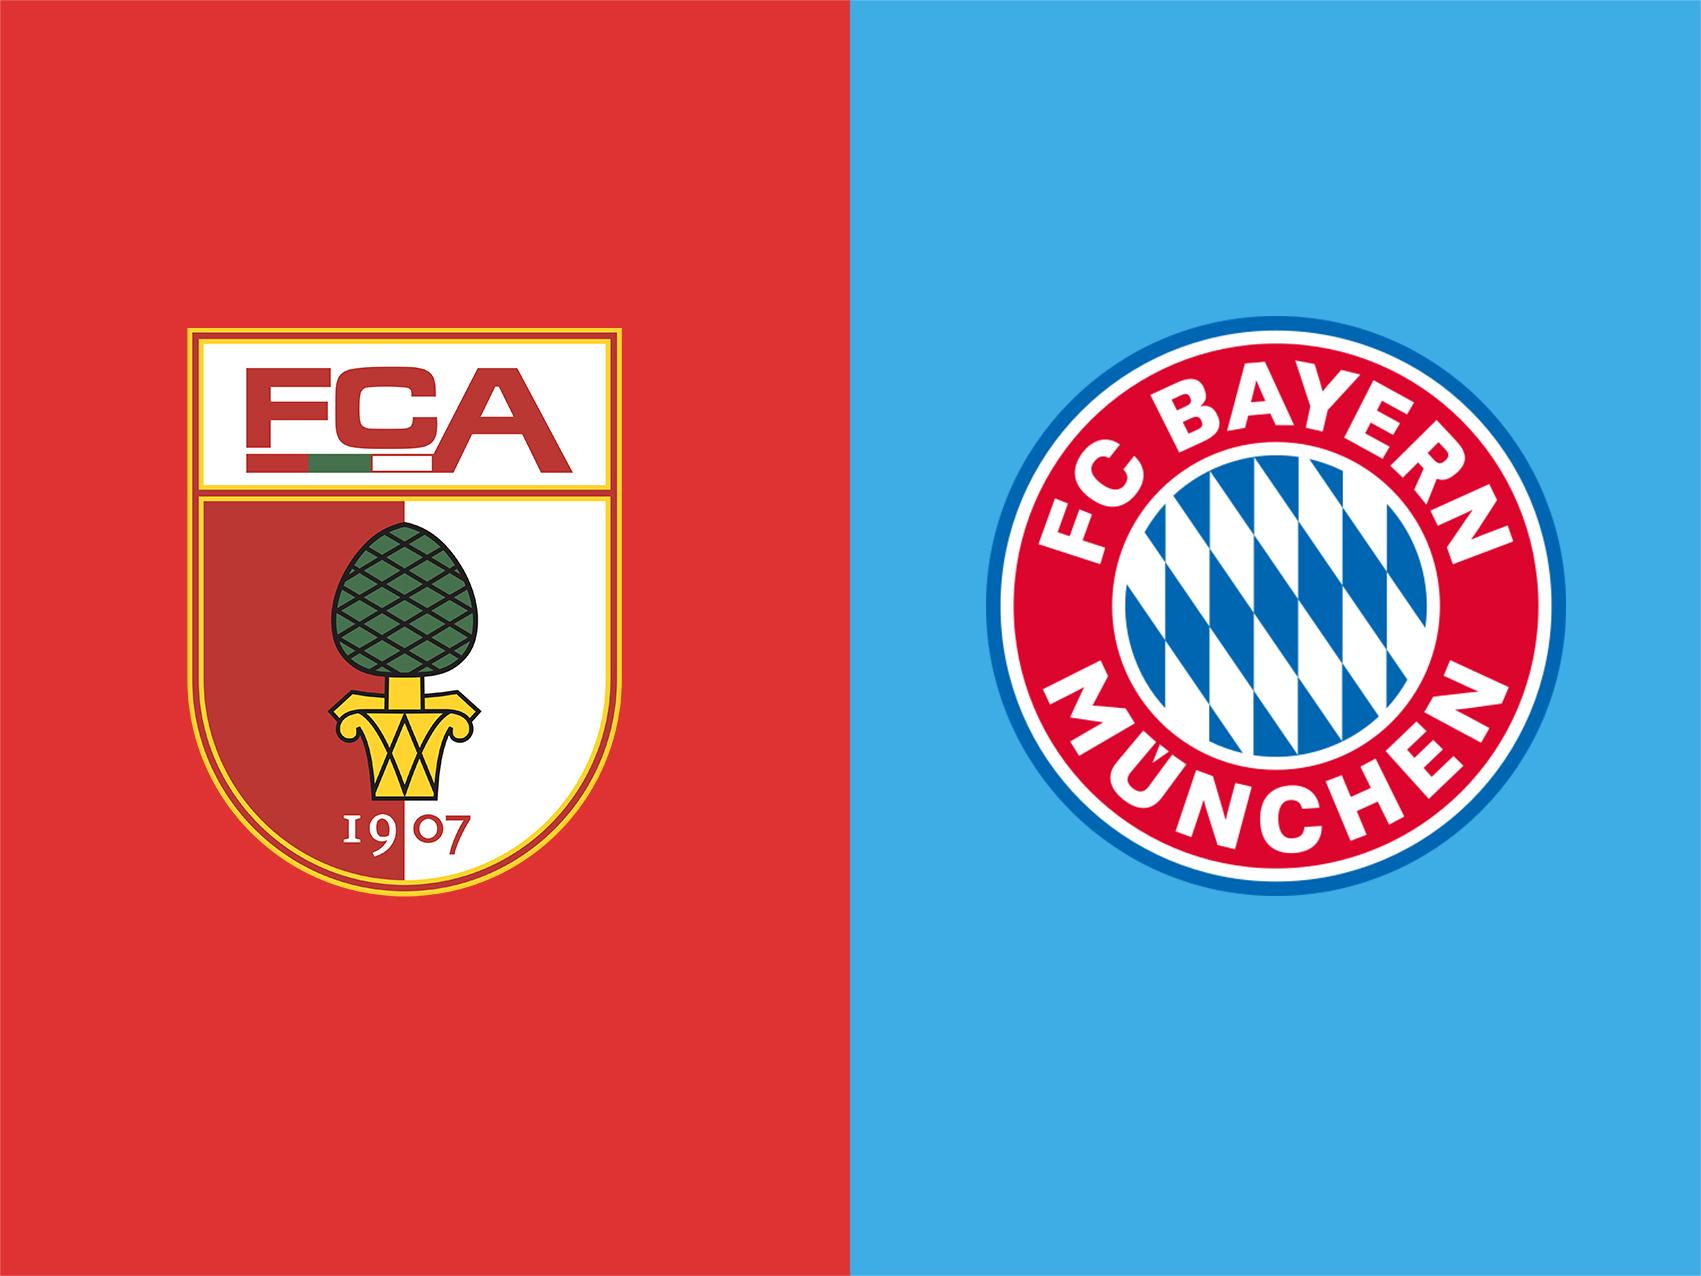 soi-keo-ca-cuoc-bong-da-ngay-19-10-augsburg-vs-bayern-munich-chu-nha-toi-nghiep-b9 1